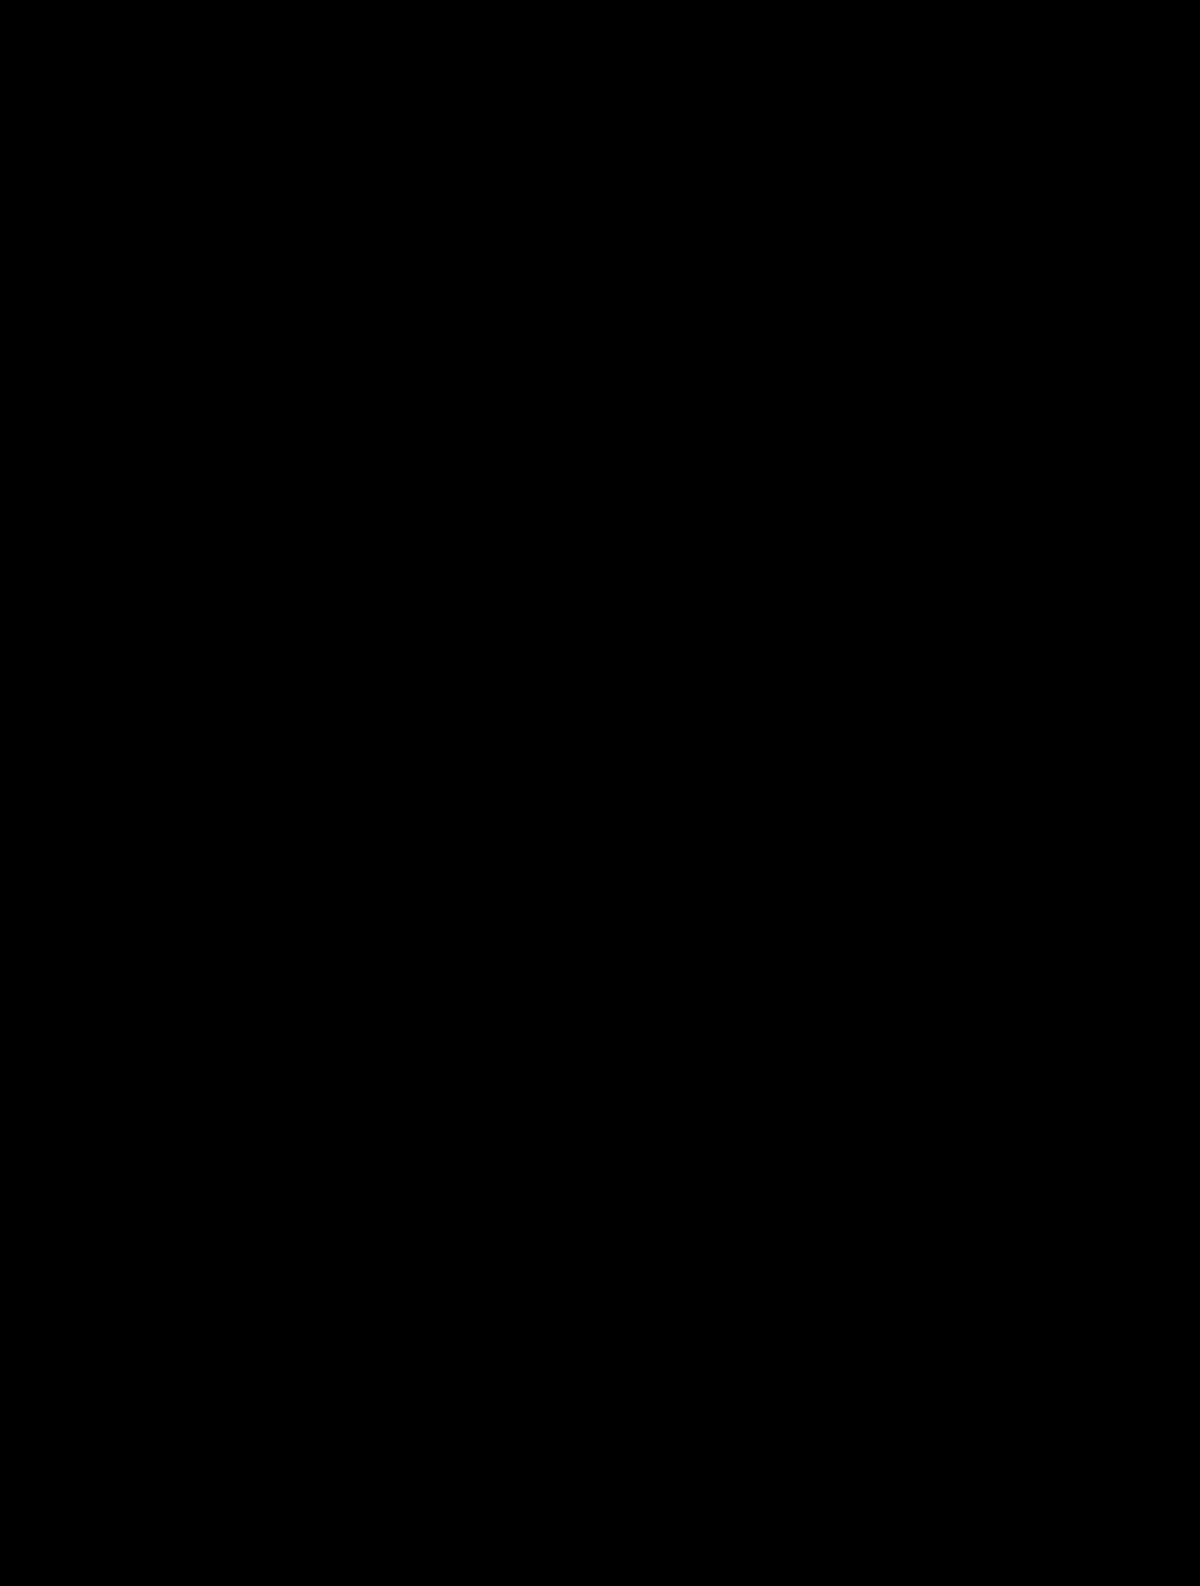 Compound Shapes Calculator